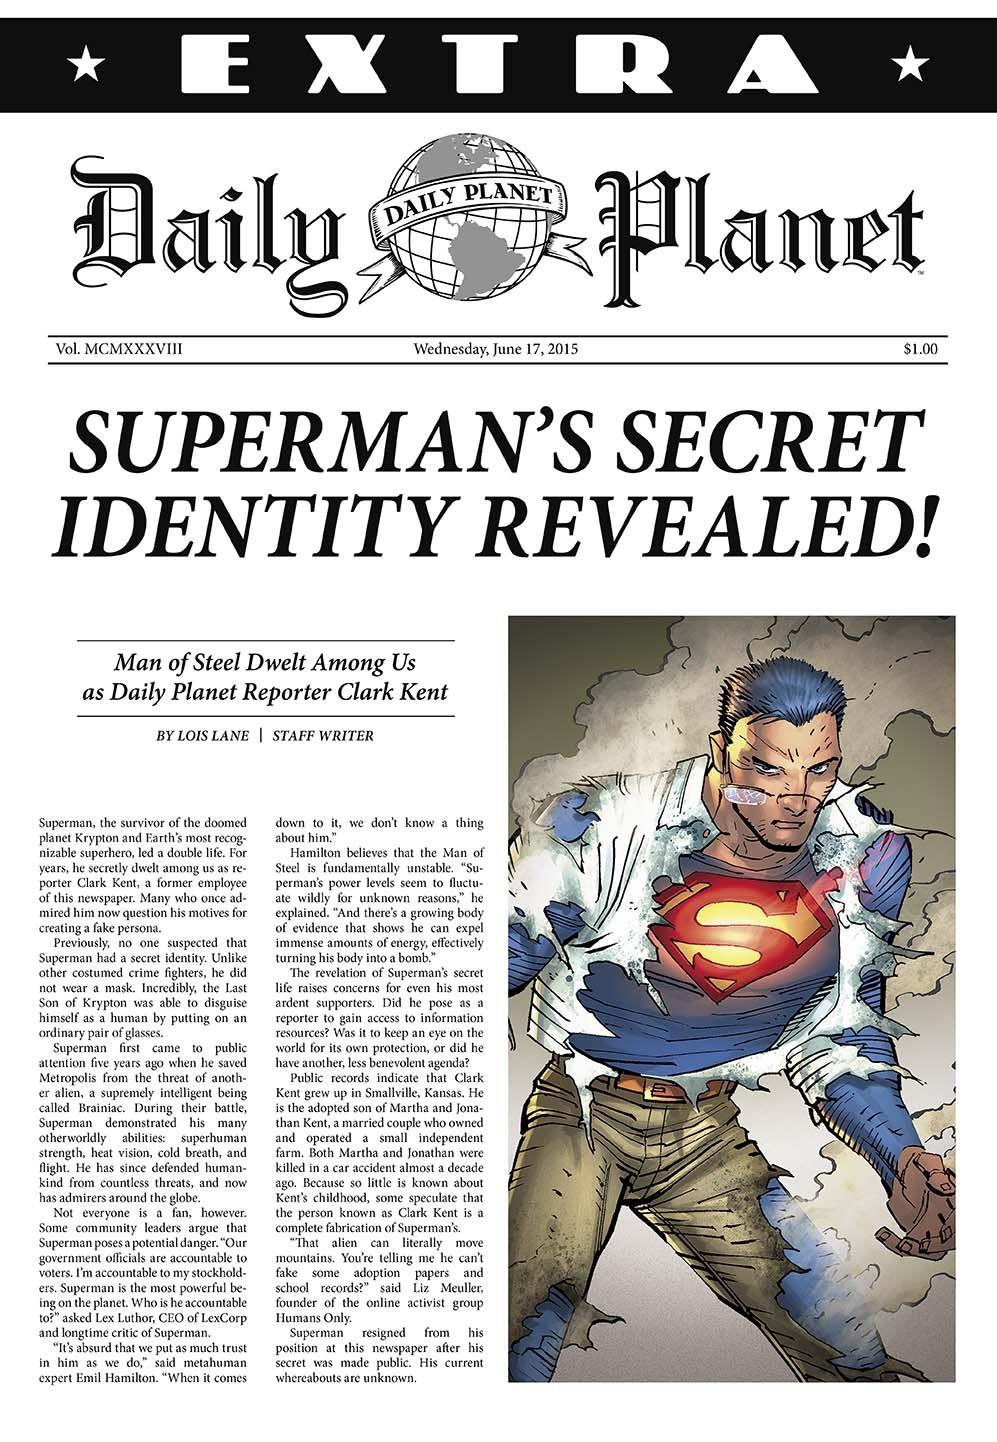 superman's secret identity revealed! by lois lane, daily planet